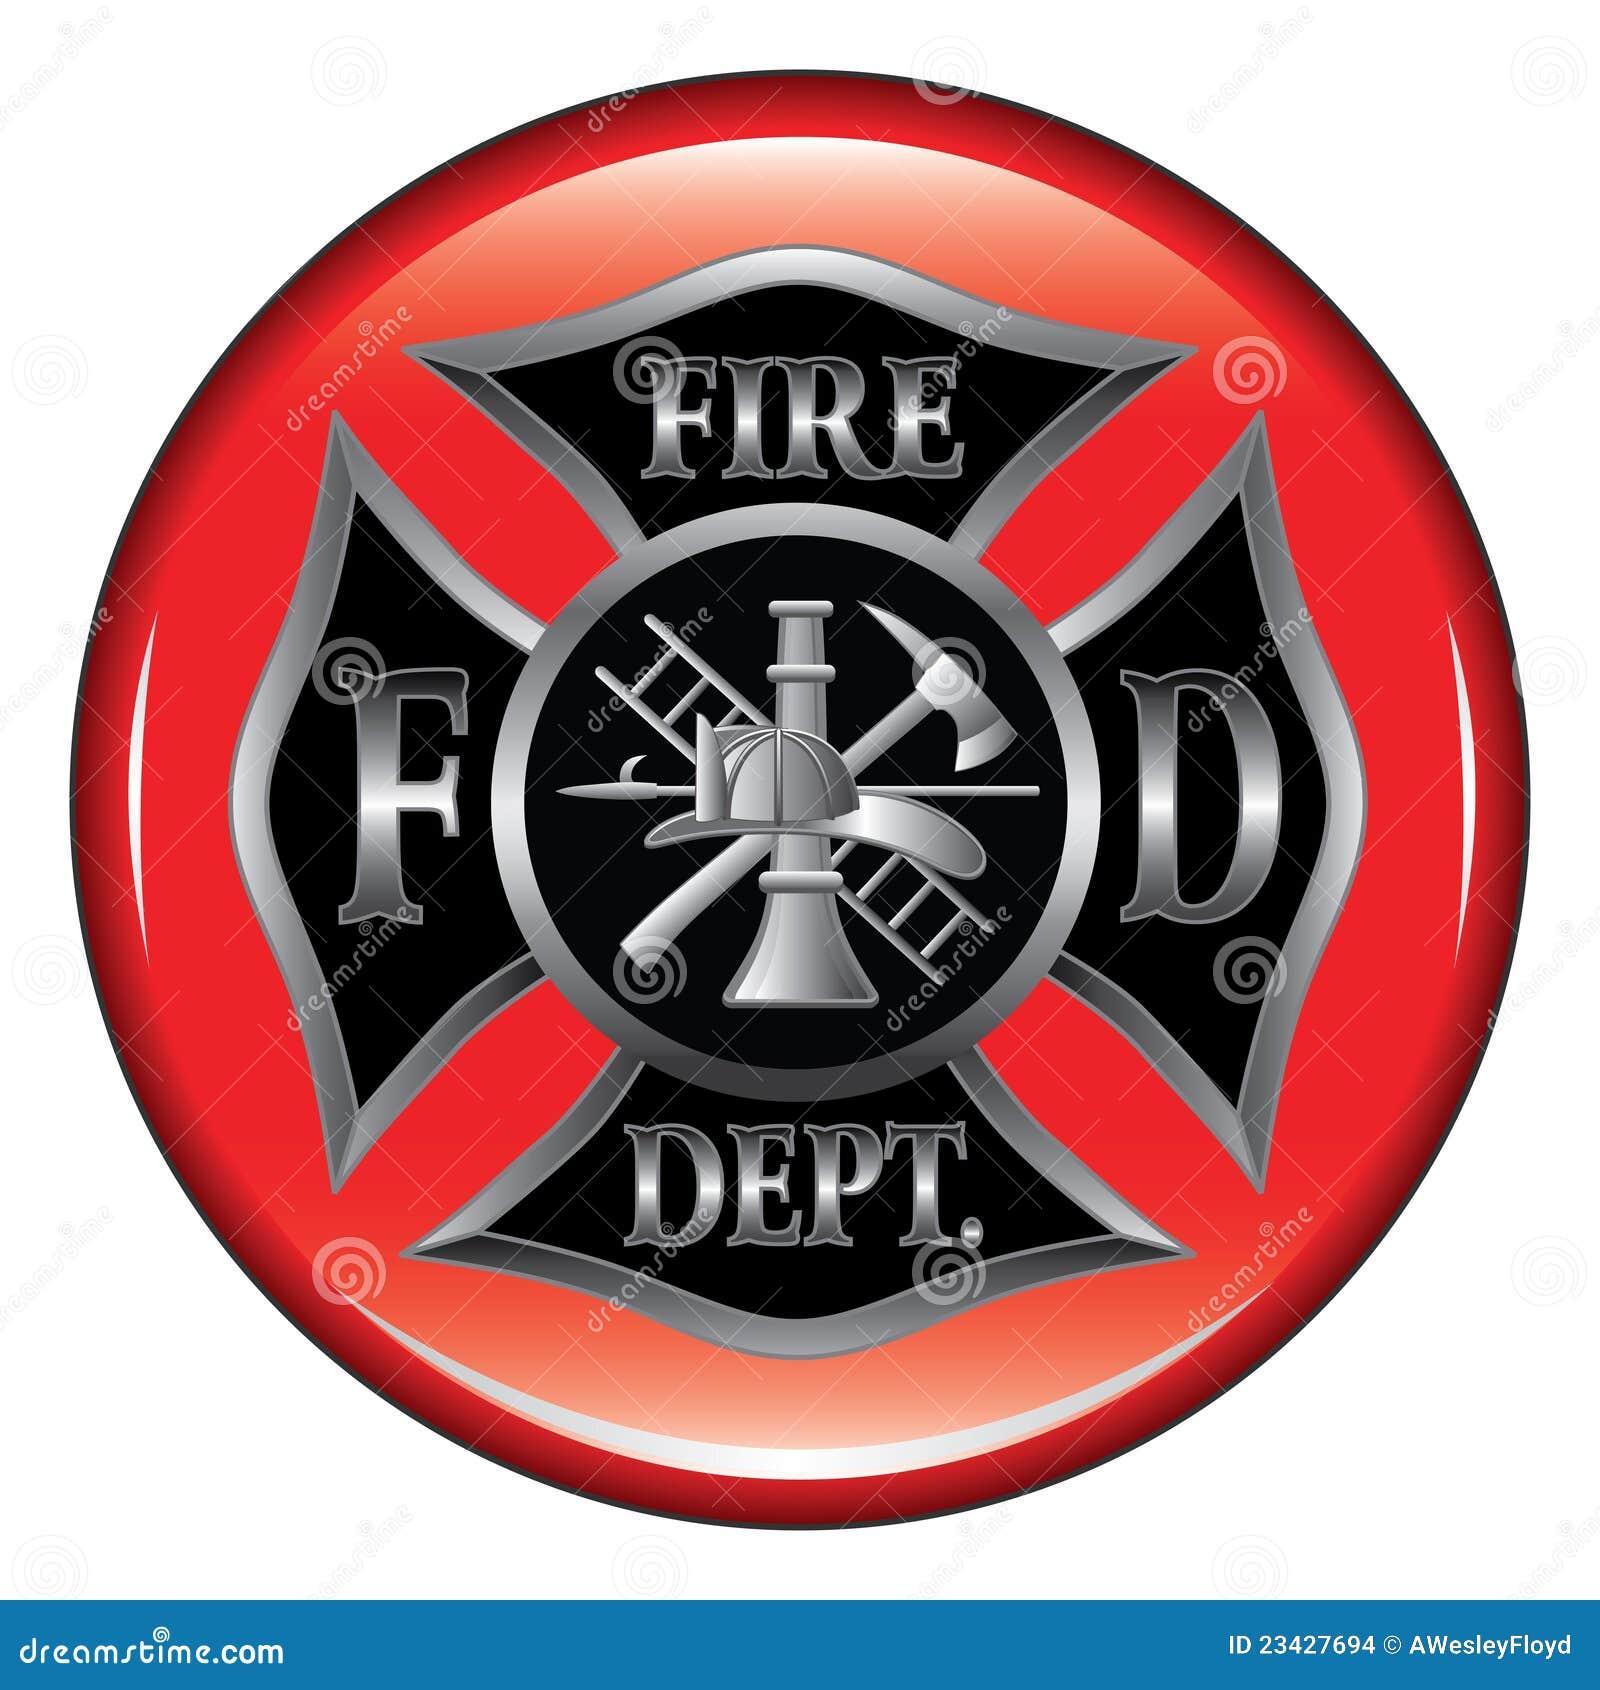 Fire department maltese cross button stock vector illustration fire department maltese cross button biocorpaavc